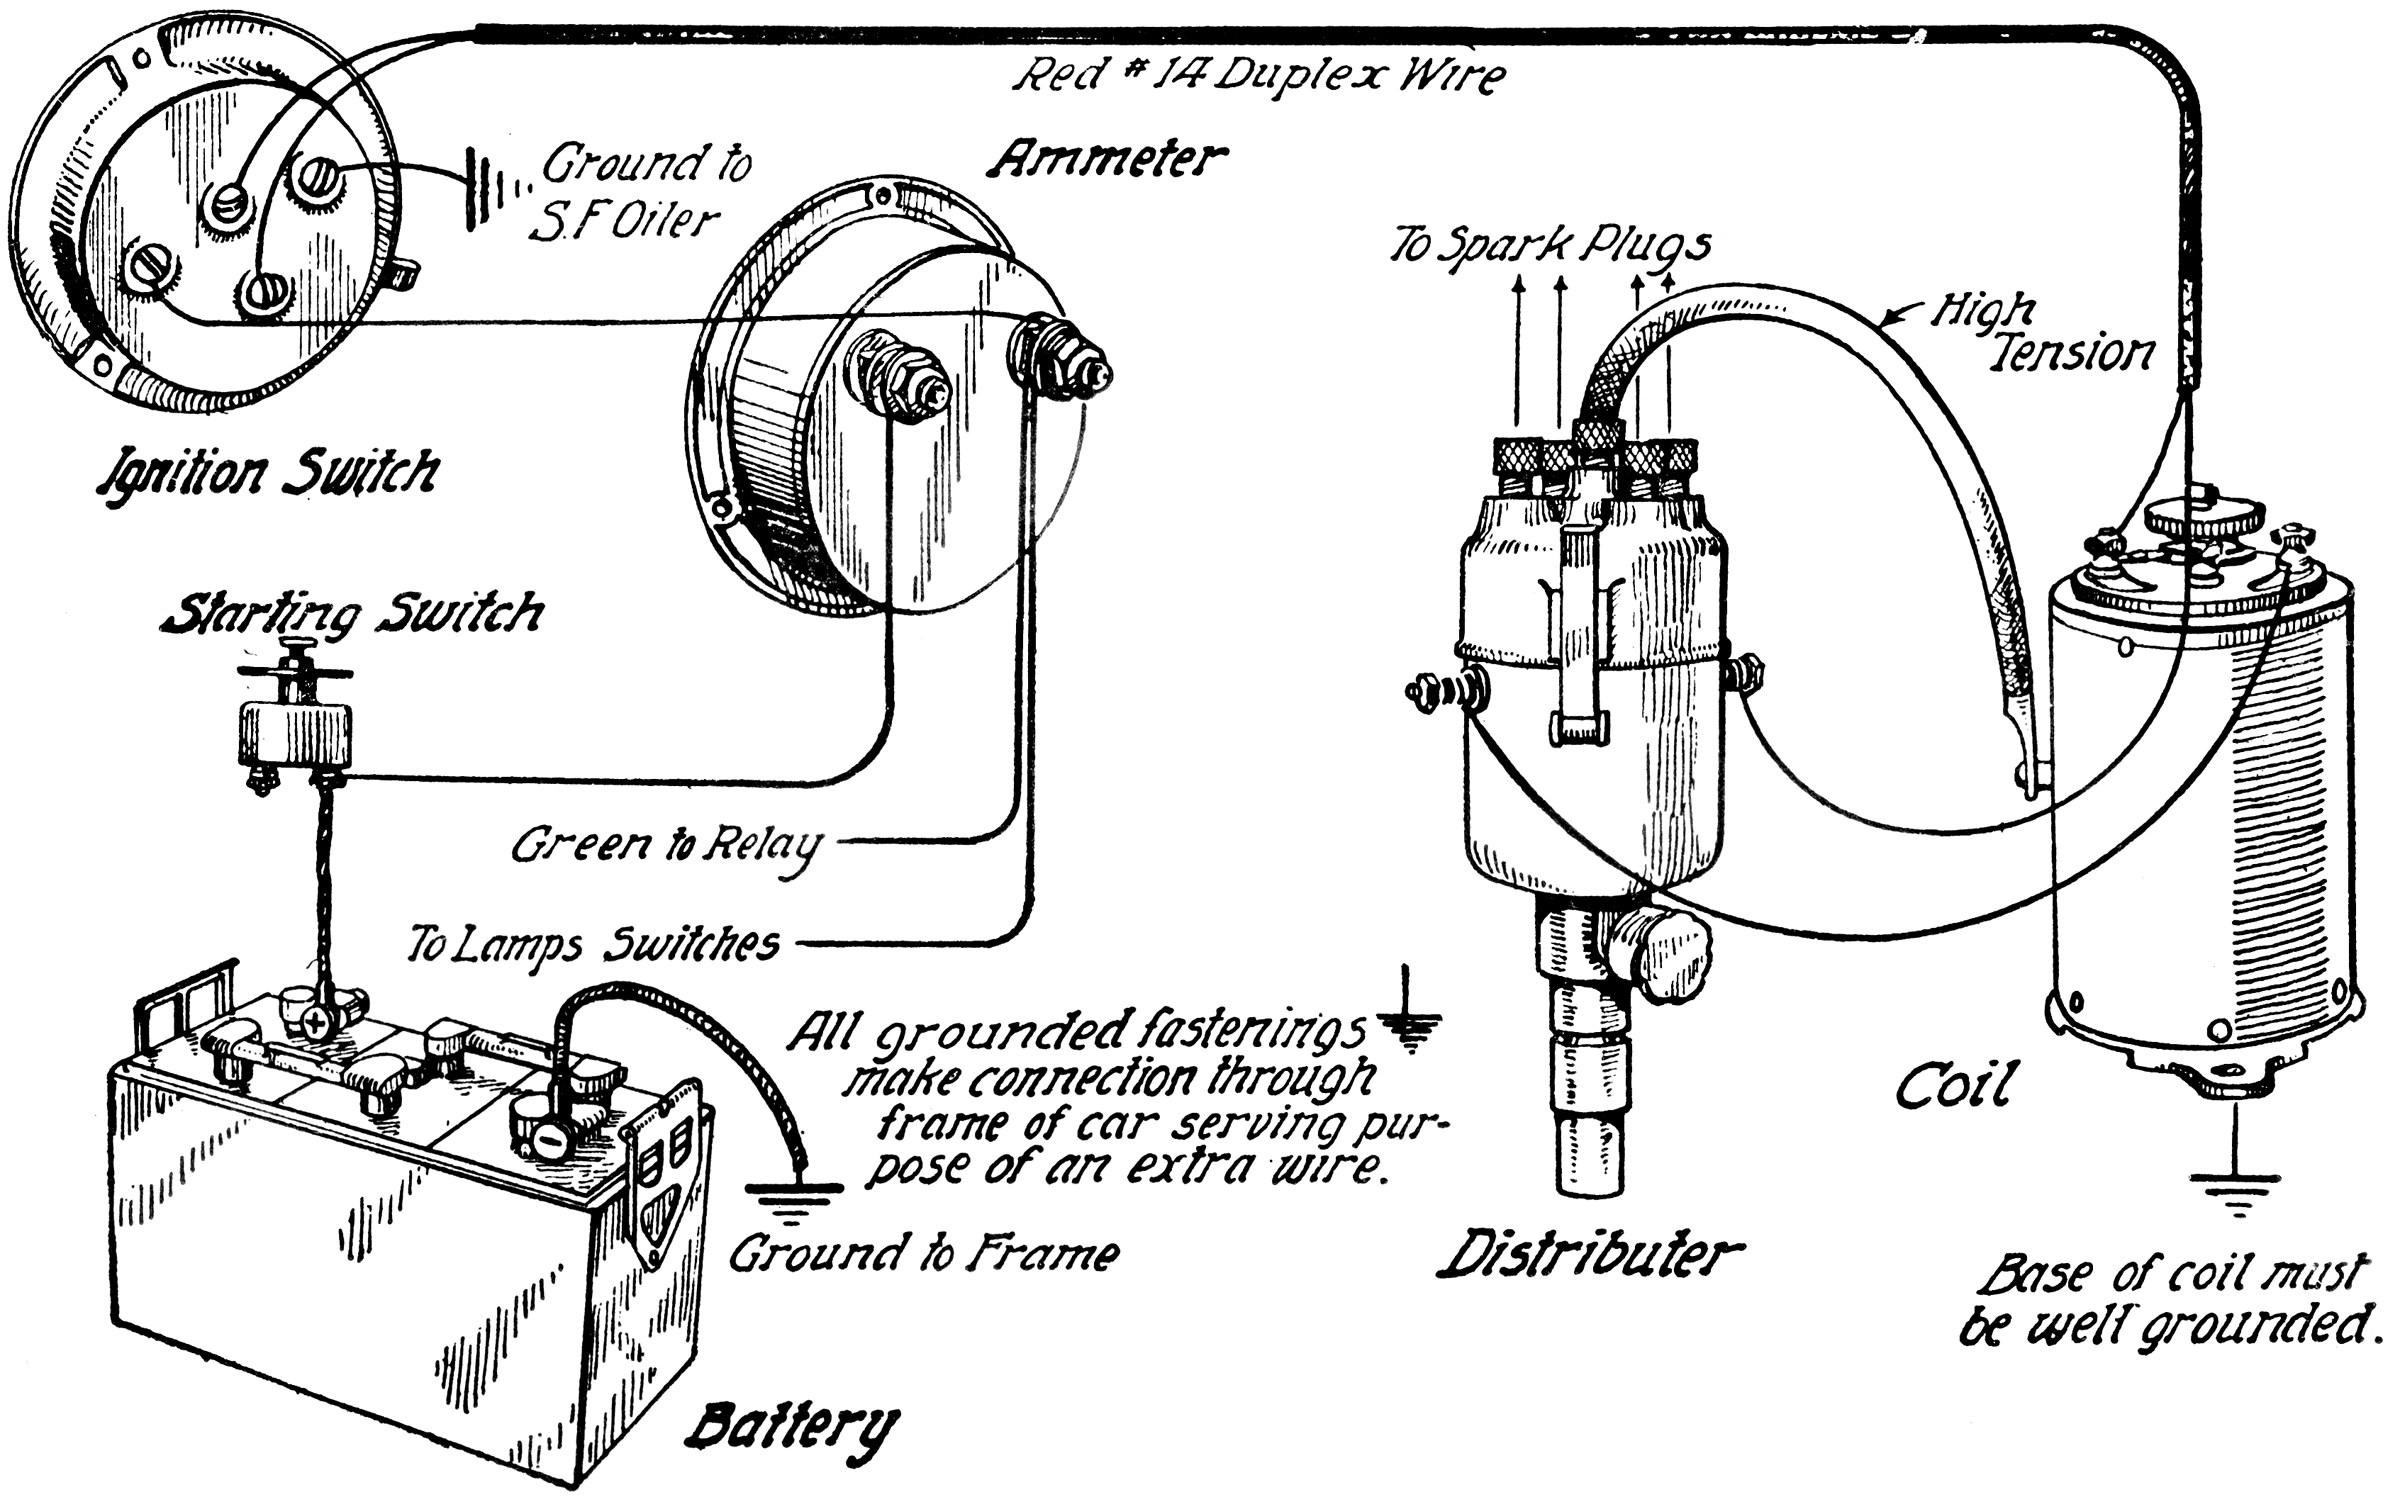 [DIAGRAM] Simple Hot Rod Wiring Diagram FULL Version HD